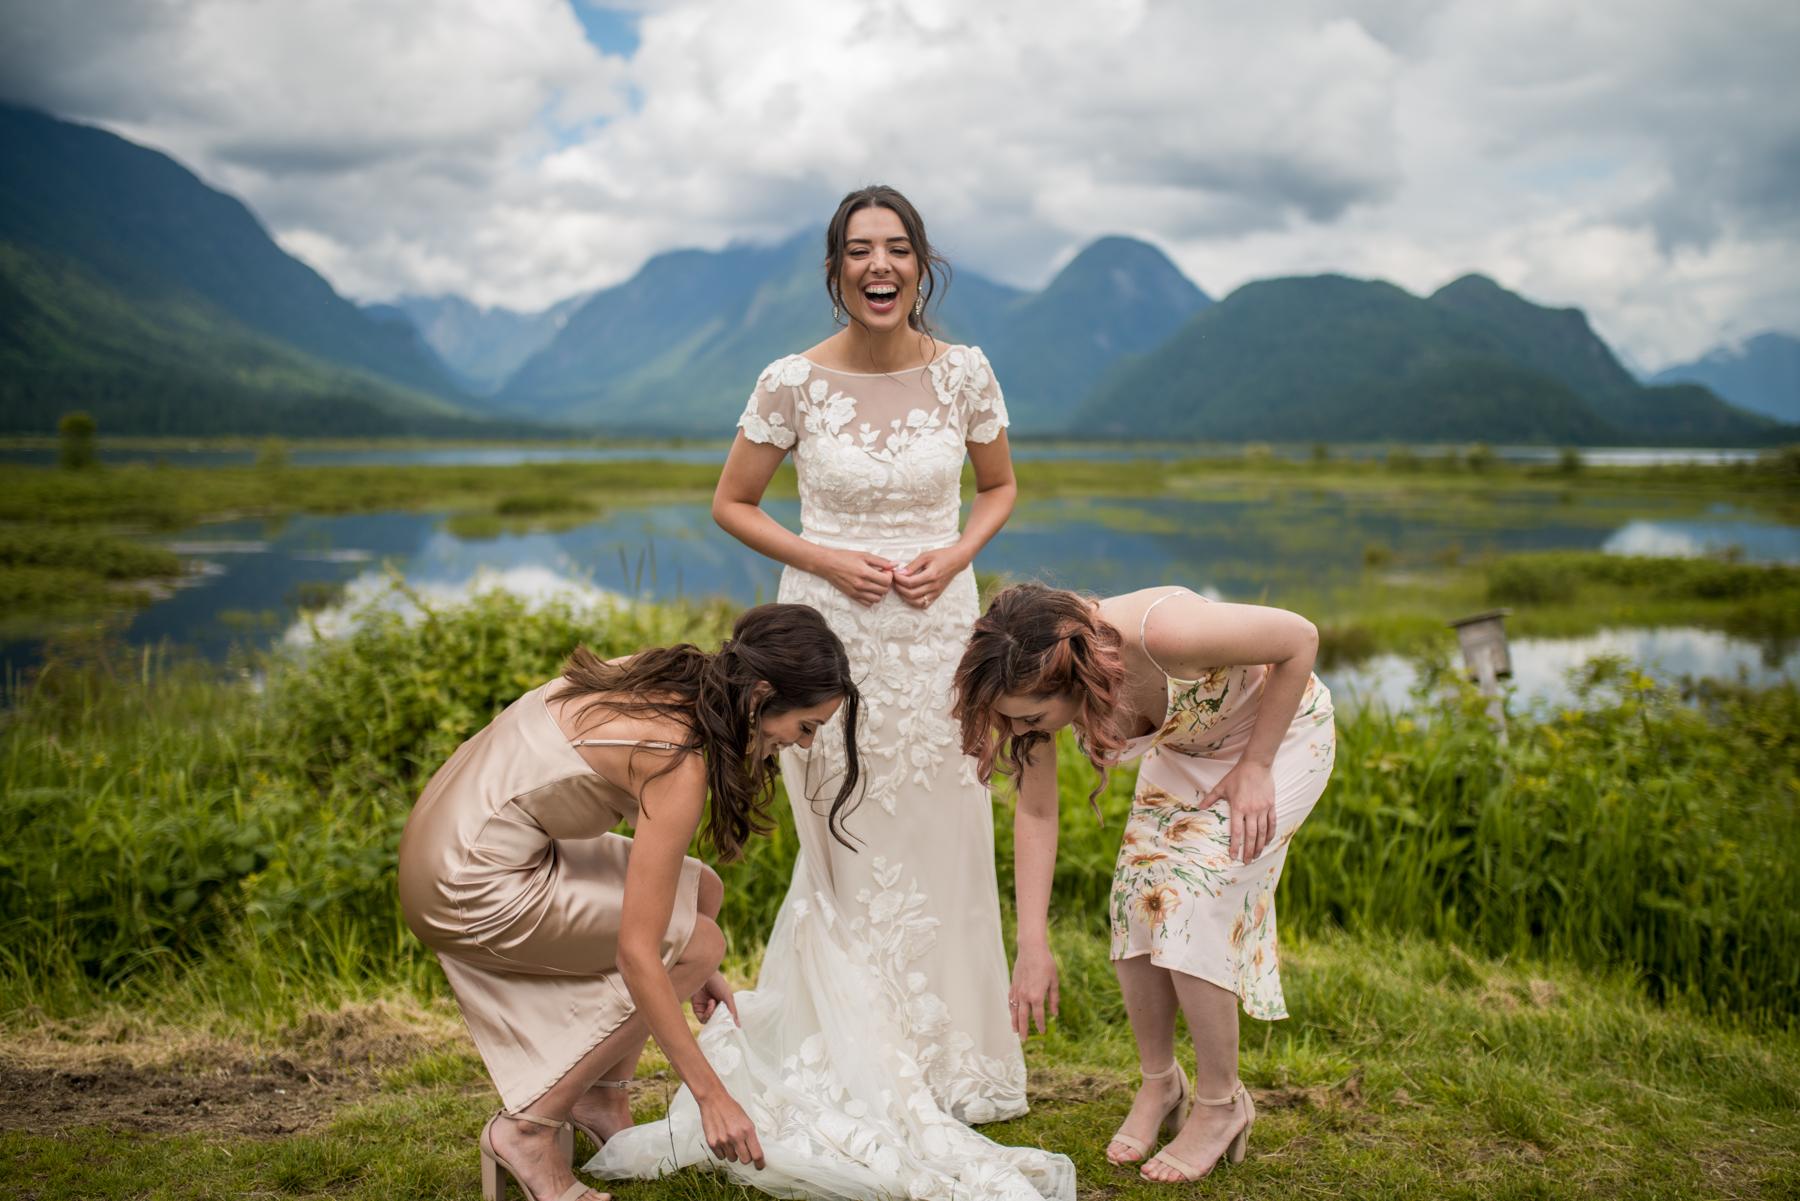 dp-wedding-web-106